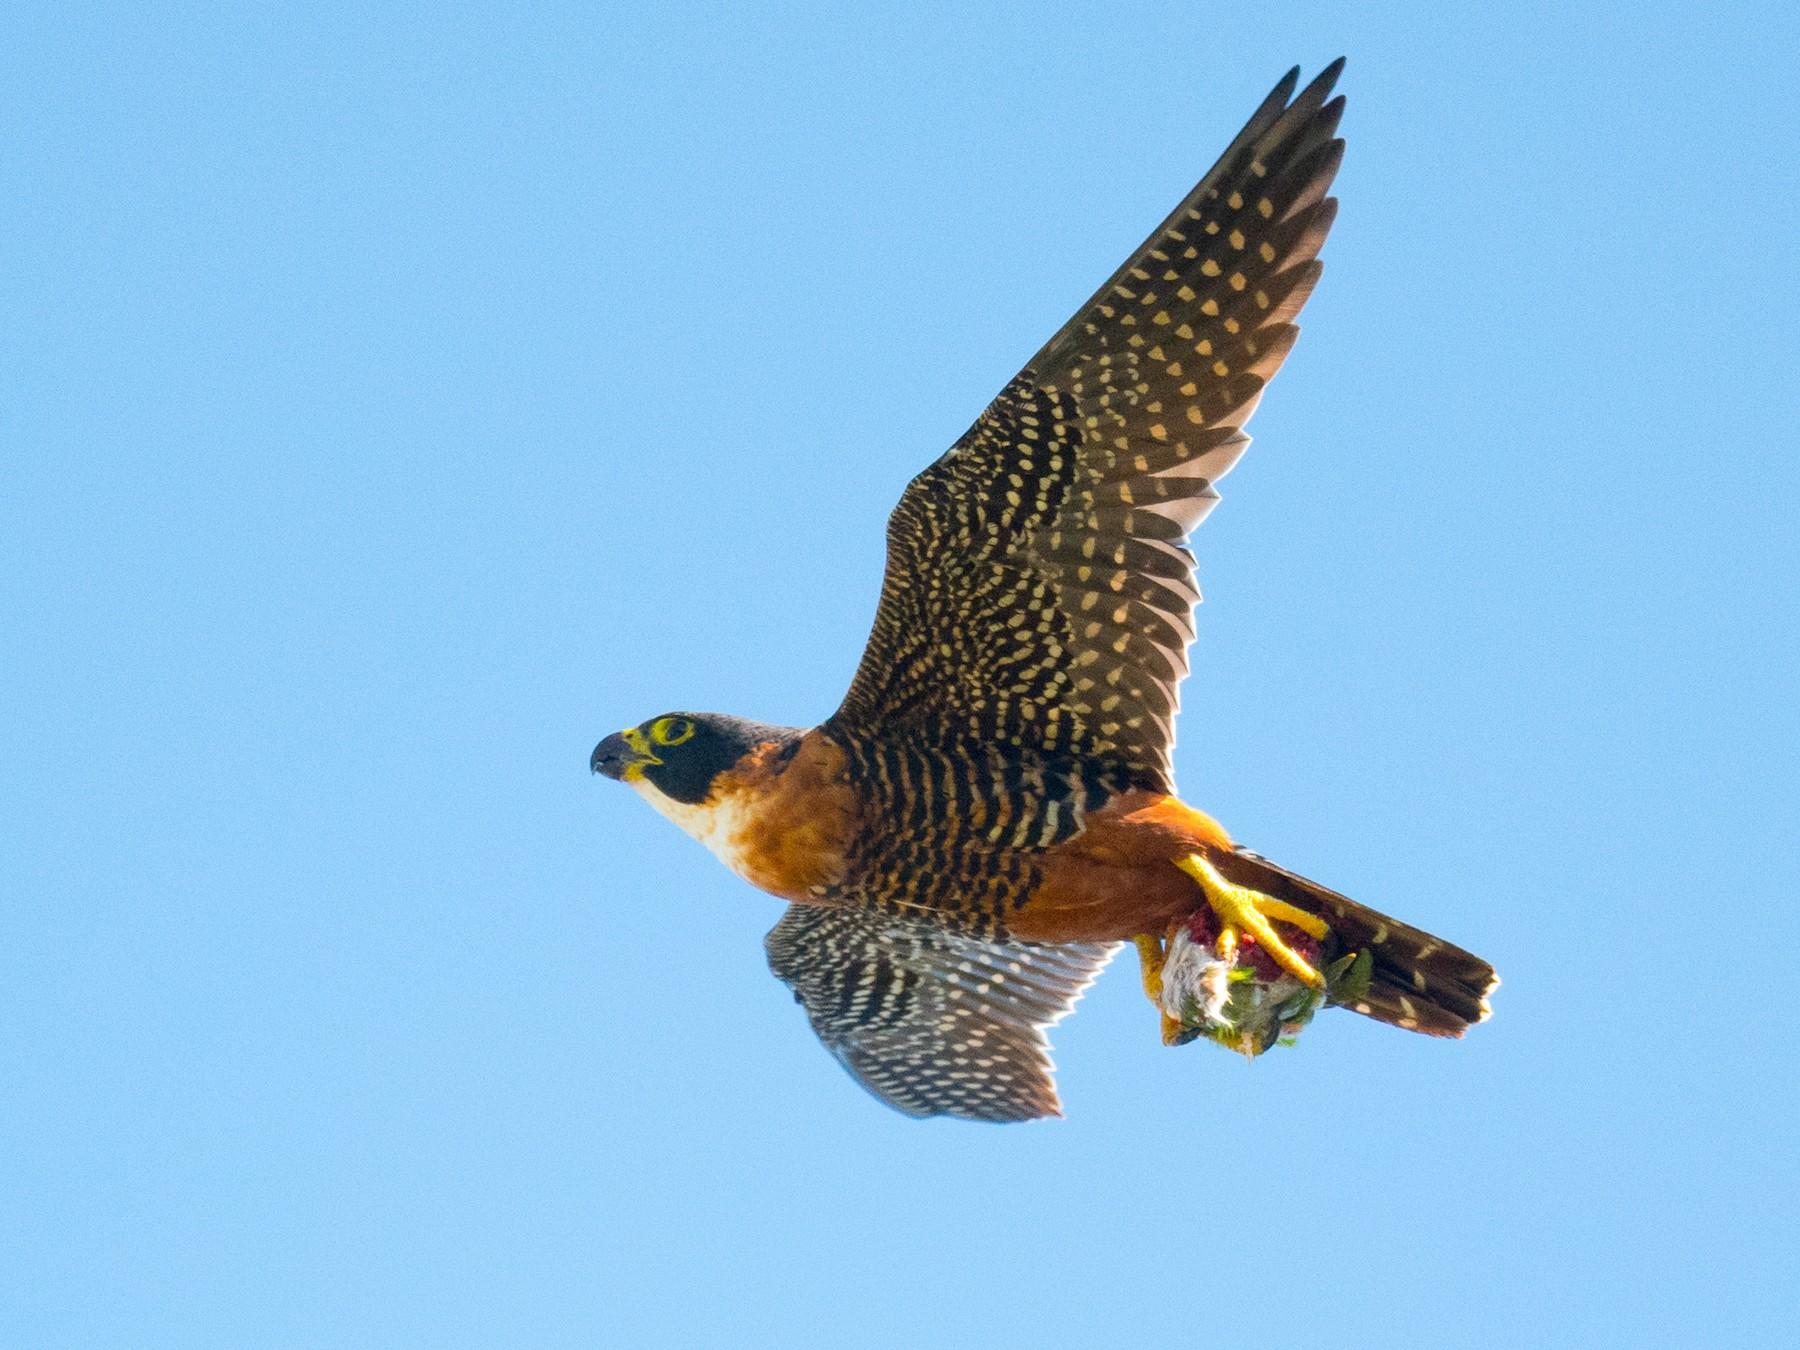 Orange-breasted Falcon - John Cahill xikanel.com